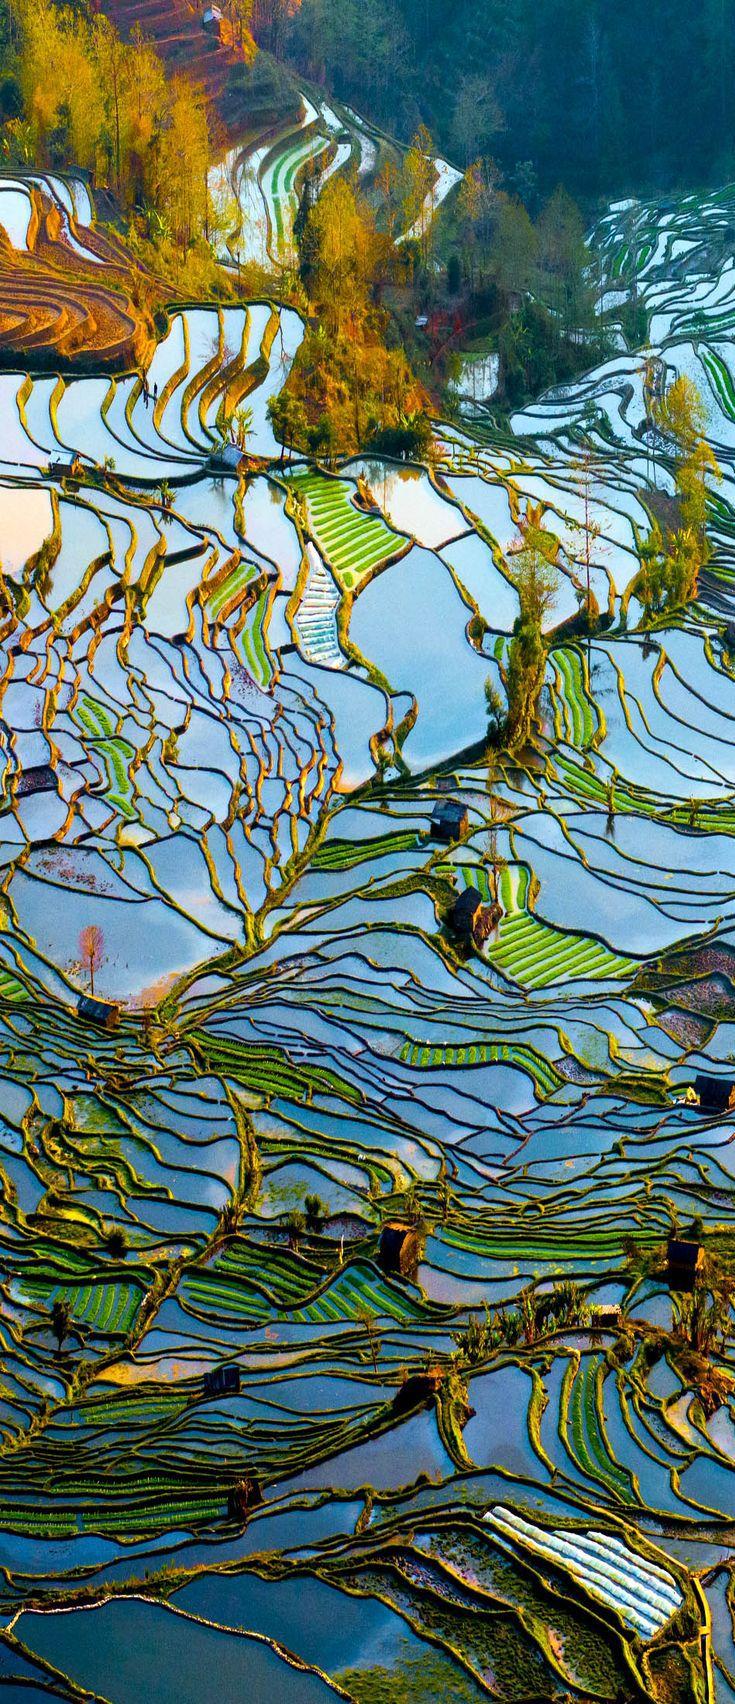 Rice Terrace Field in Water Season - Yuan Yang | China